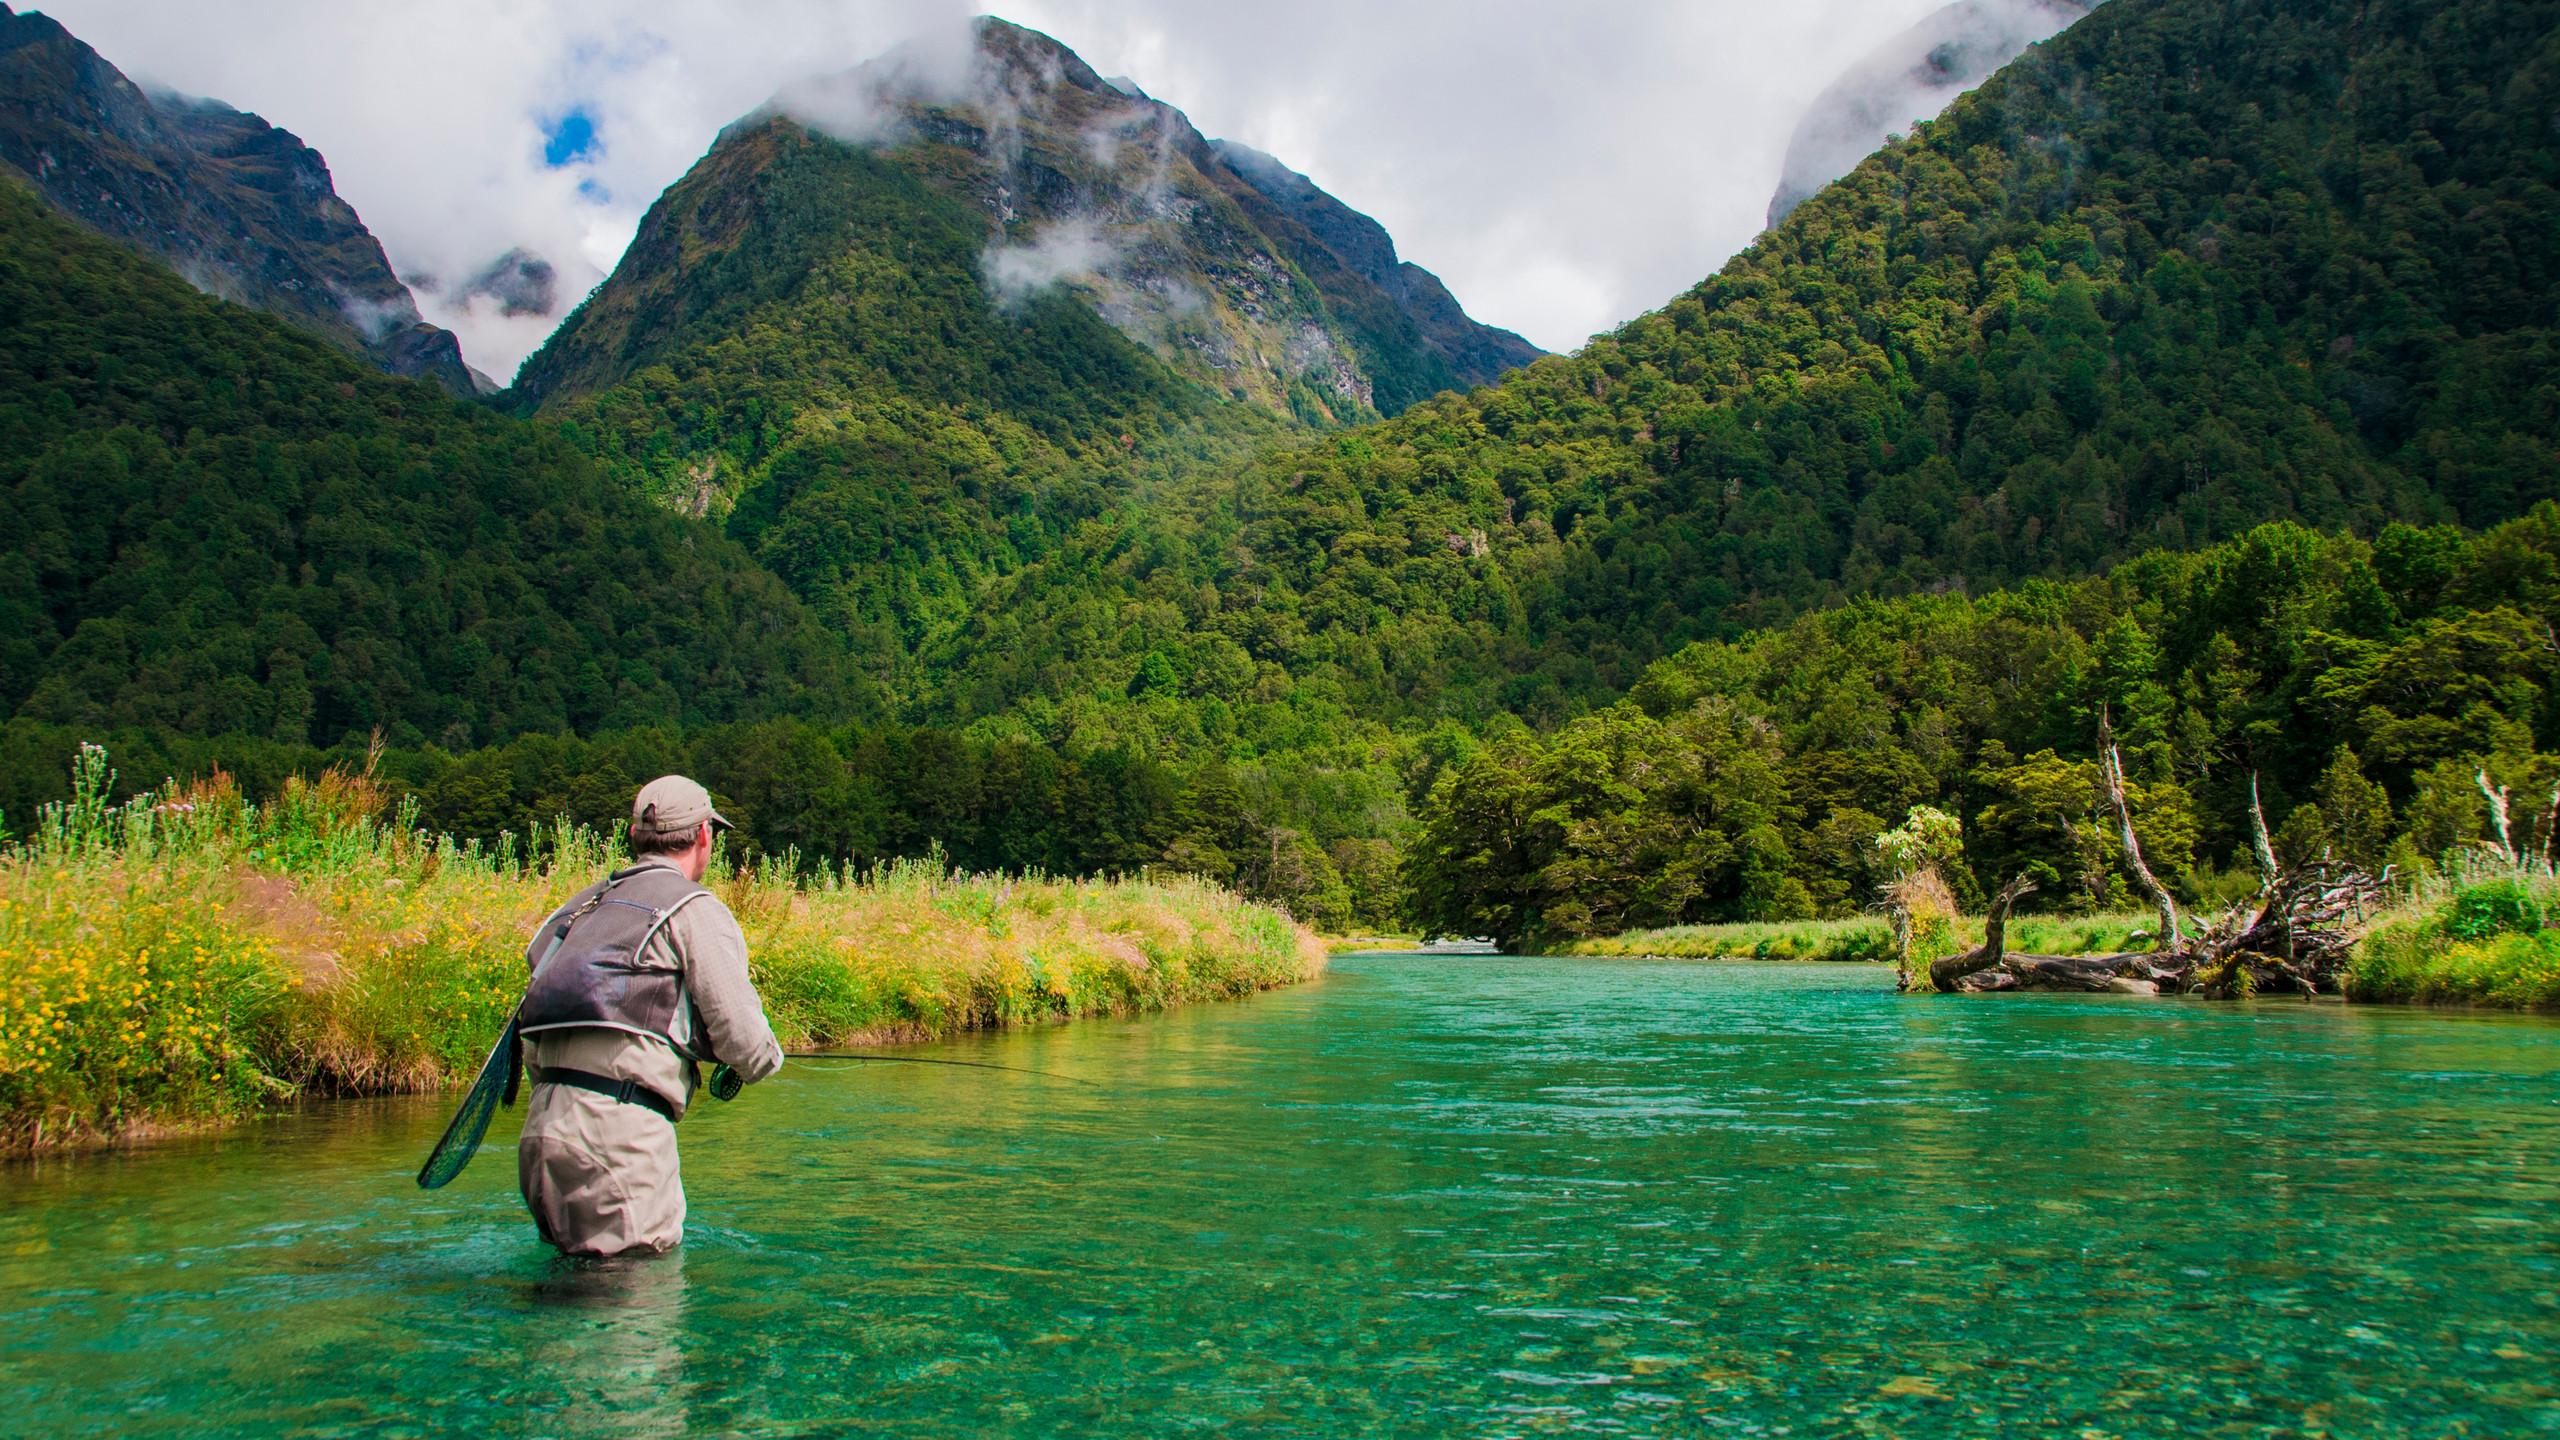 Fishing in Fiordland National Park New Zealand